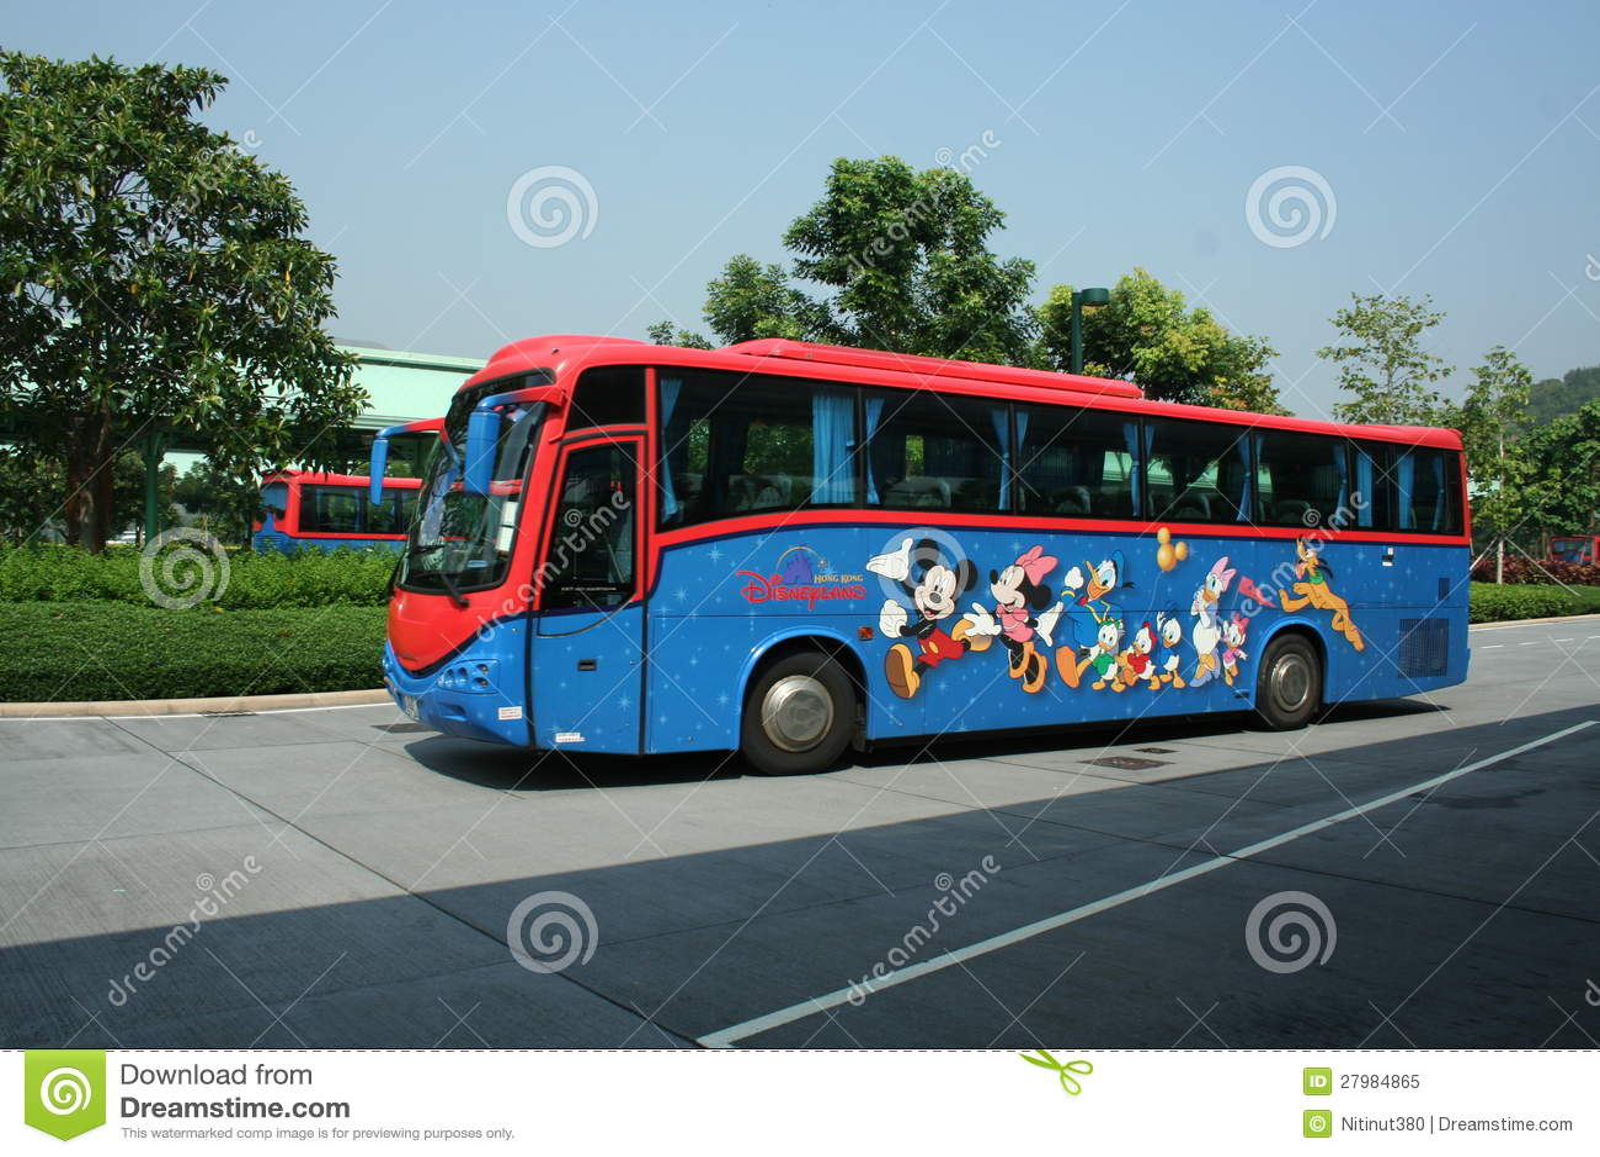 hongkong disneyland shuttle bus editorial image image 27984865. Black Bedroom Furniture Sets. Home Design Ideas